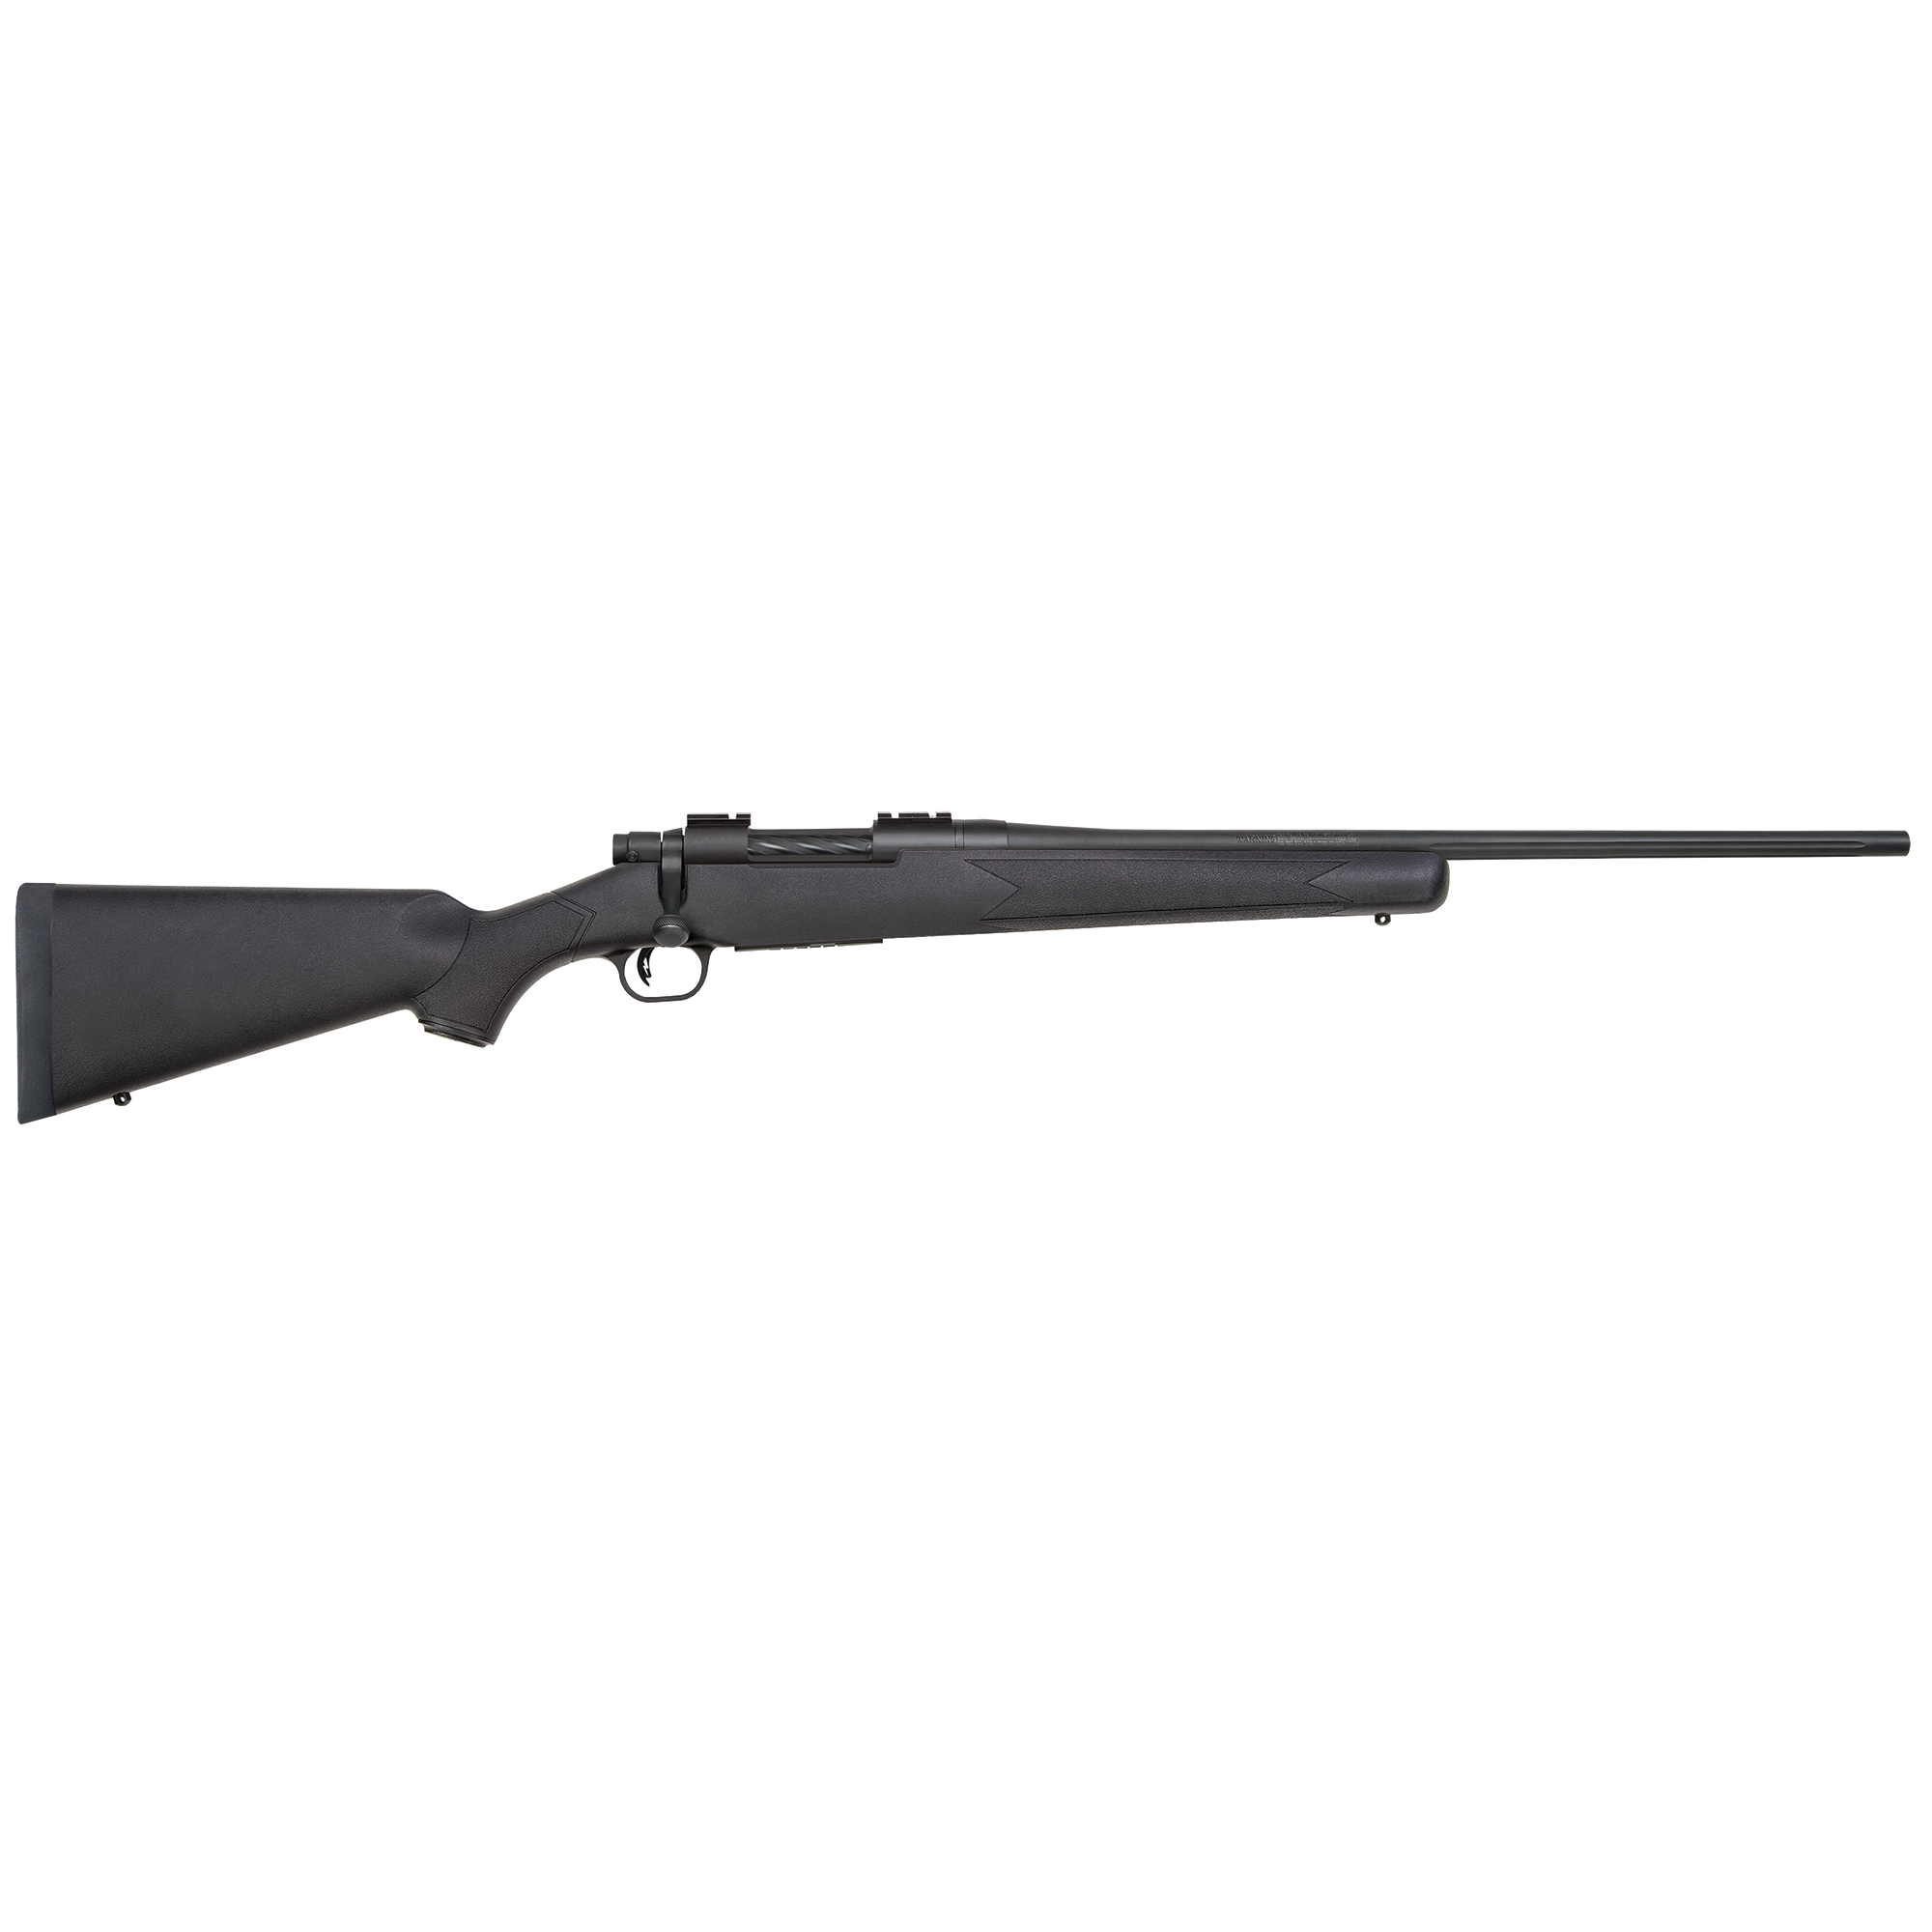 Mossberg Patriot Centerfire Rifle, .243 Win, Black